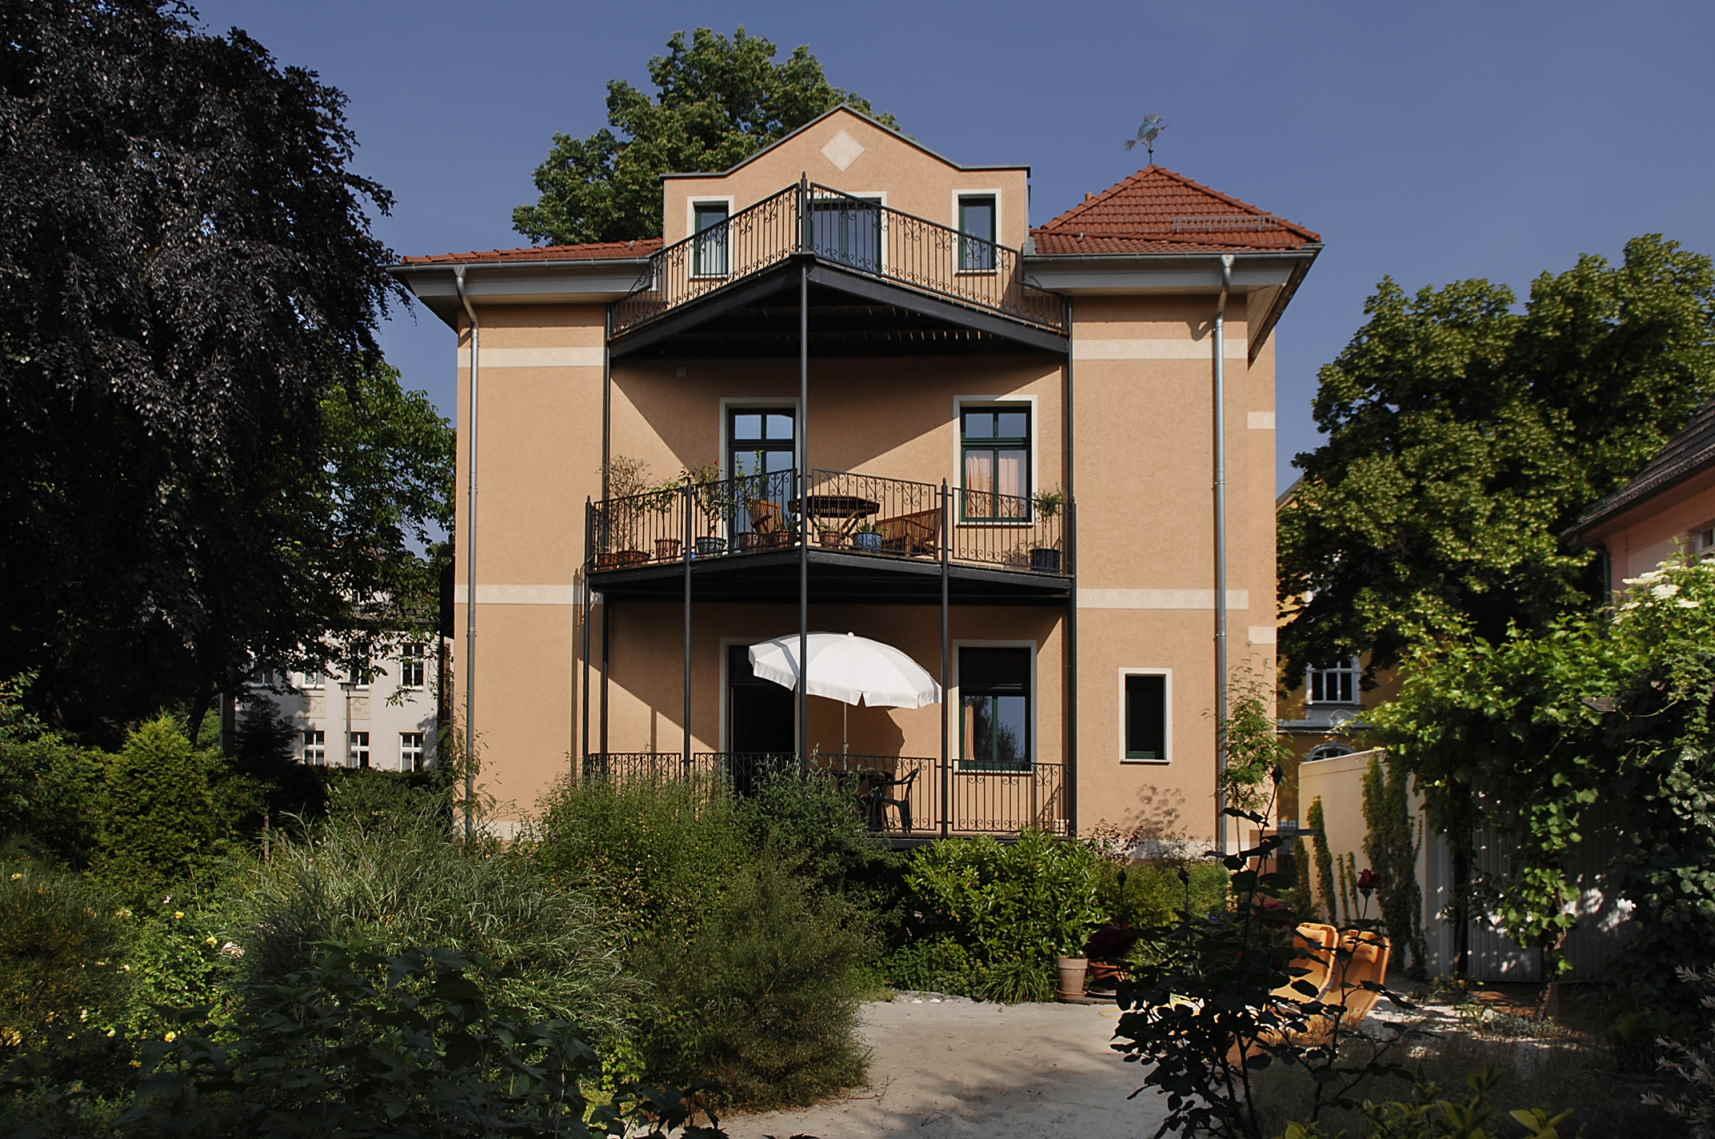 berlin villa seepark ferienwohnung. Black Bedroom Furniture Sets. Home Design Ideas